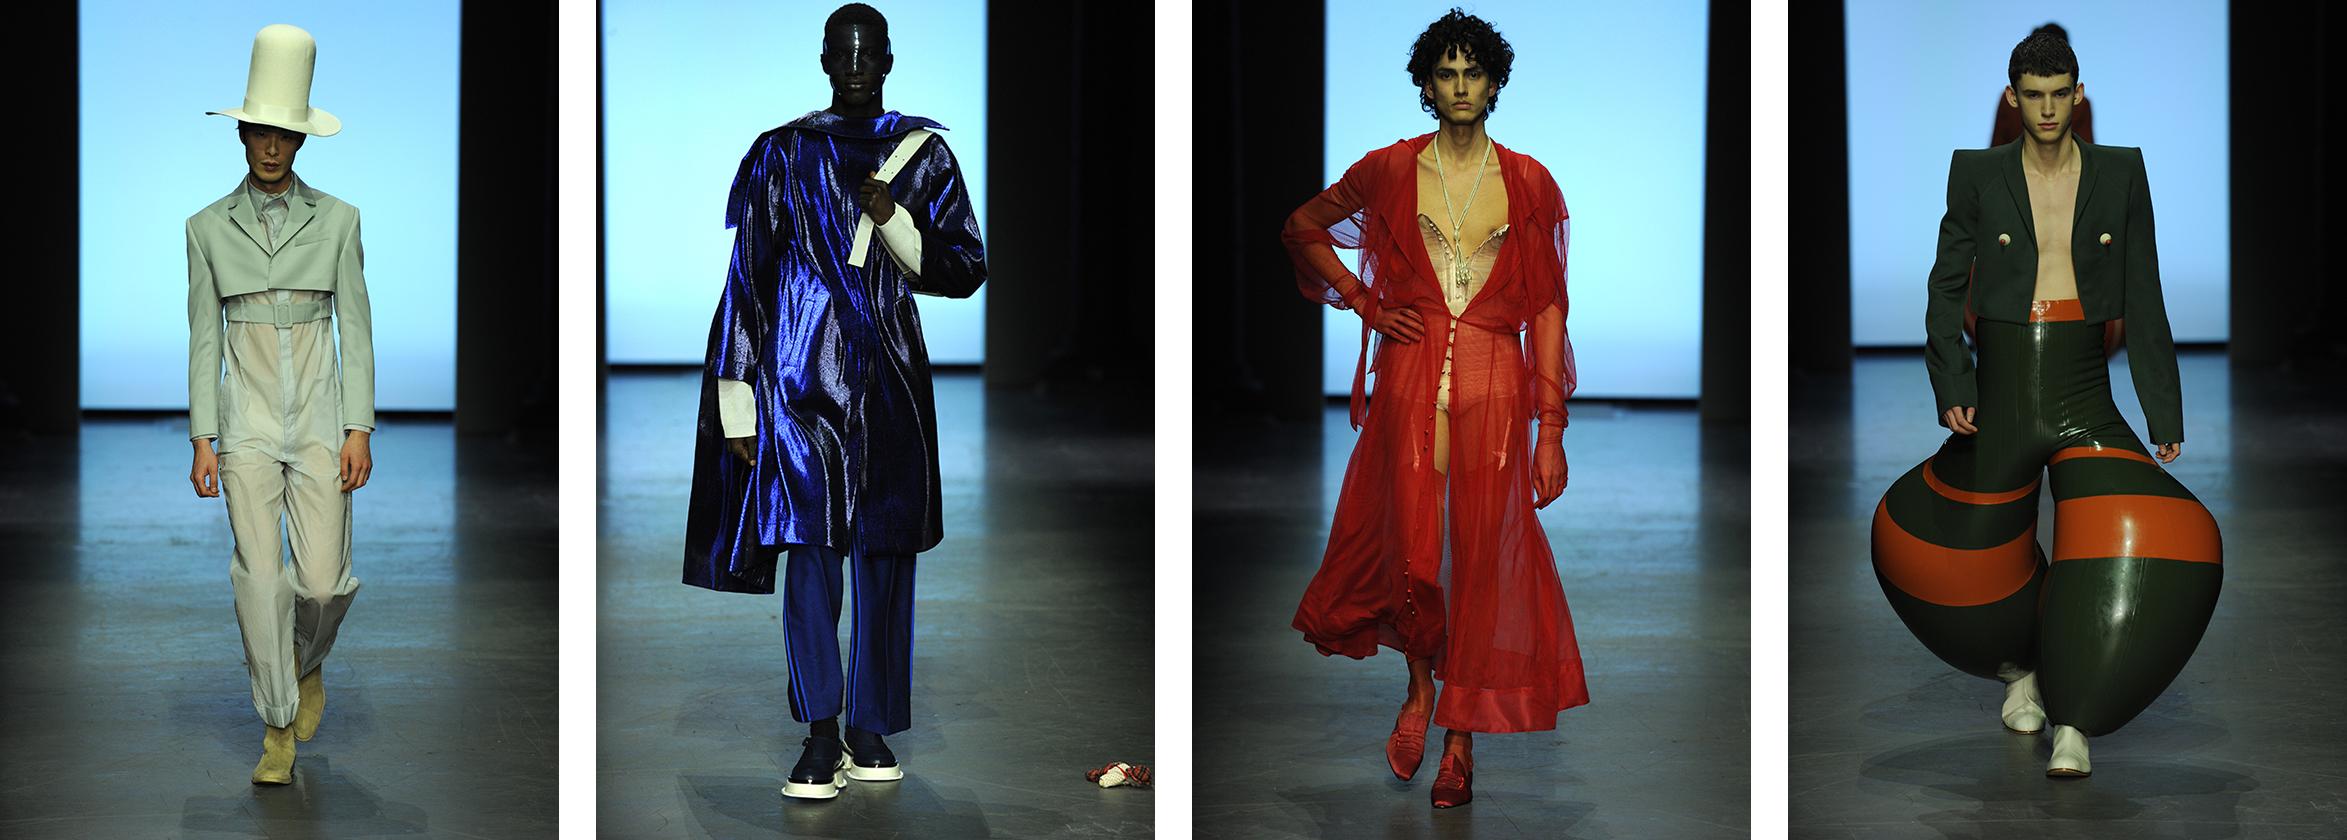 Male models on catwalk